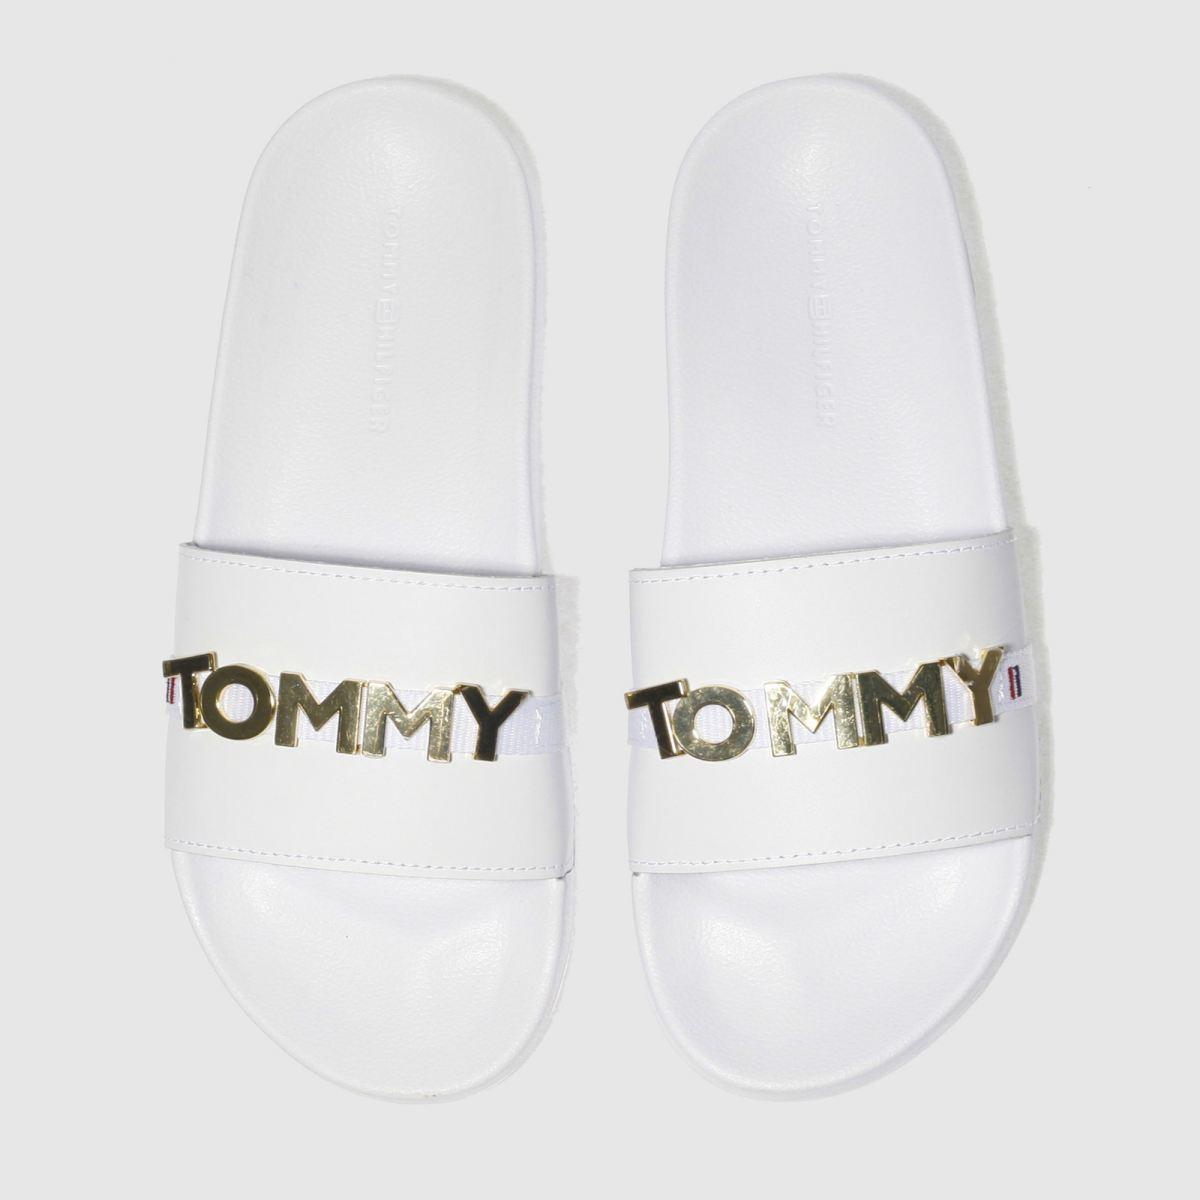 Tommy Hilfiger Tommy Hilfiger White & Gold Beach Slide Sandals